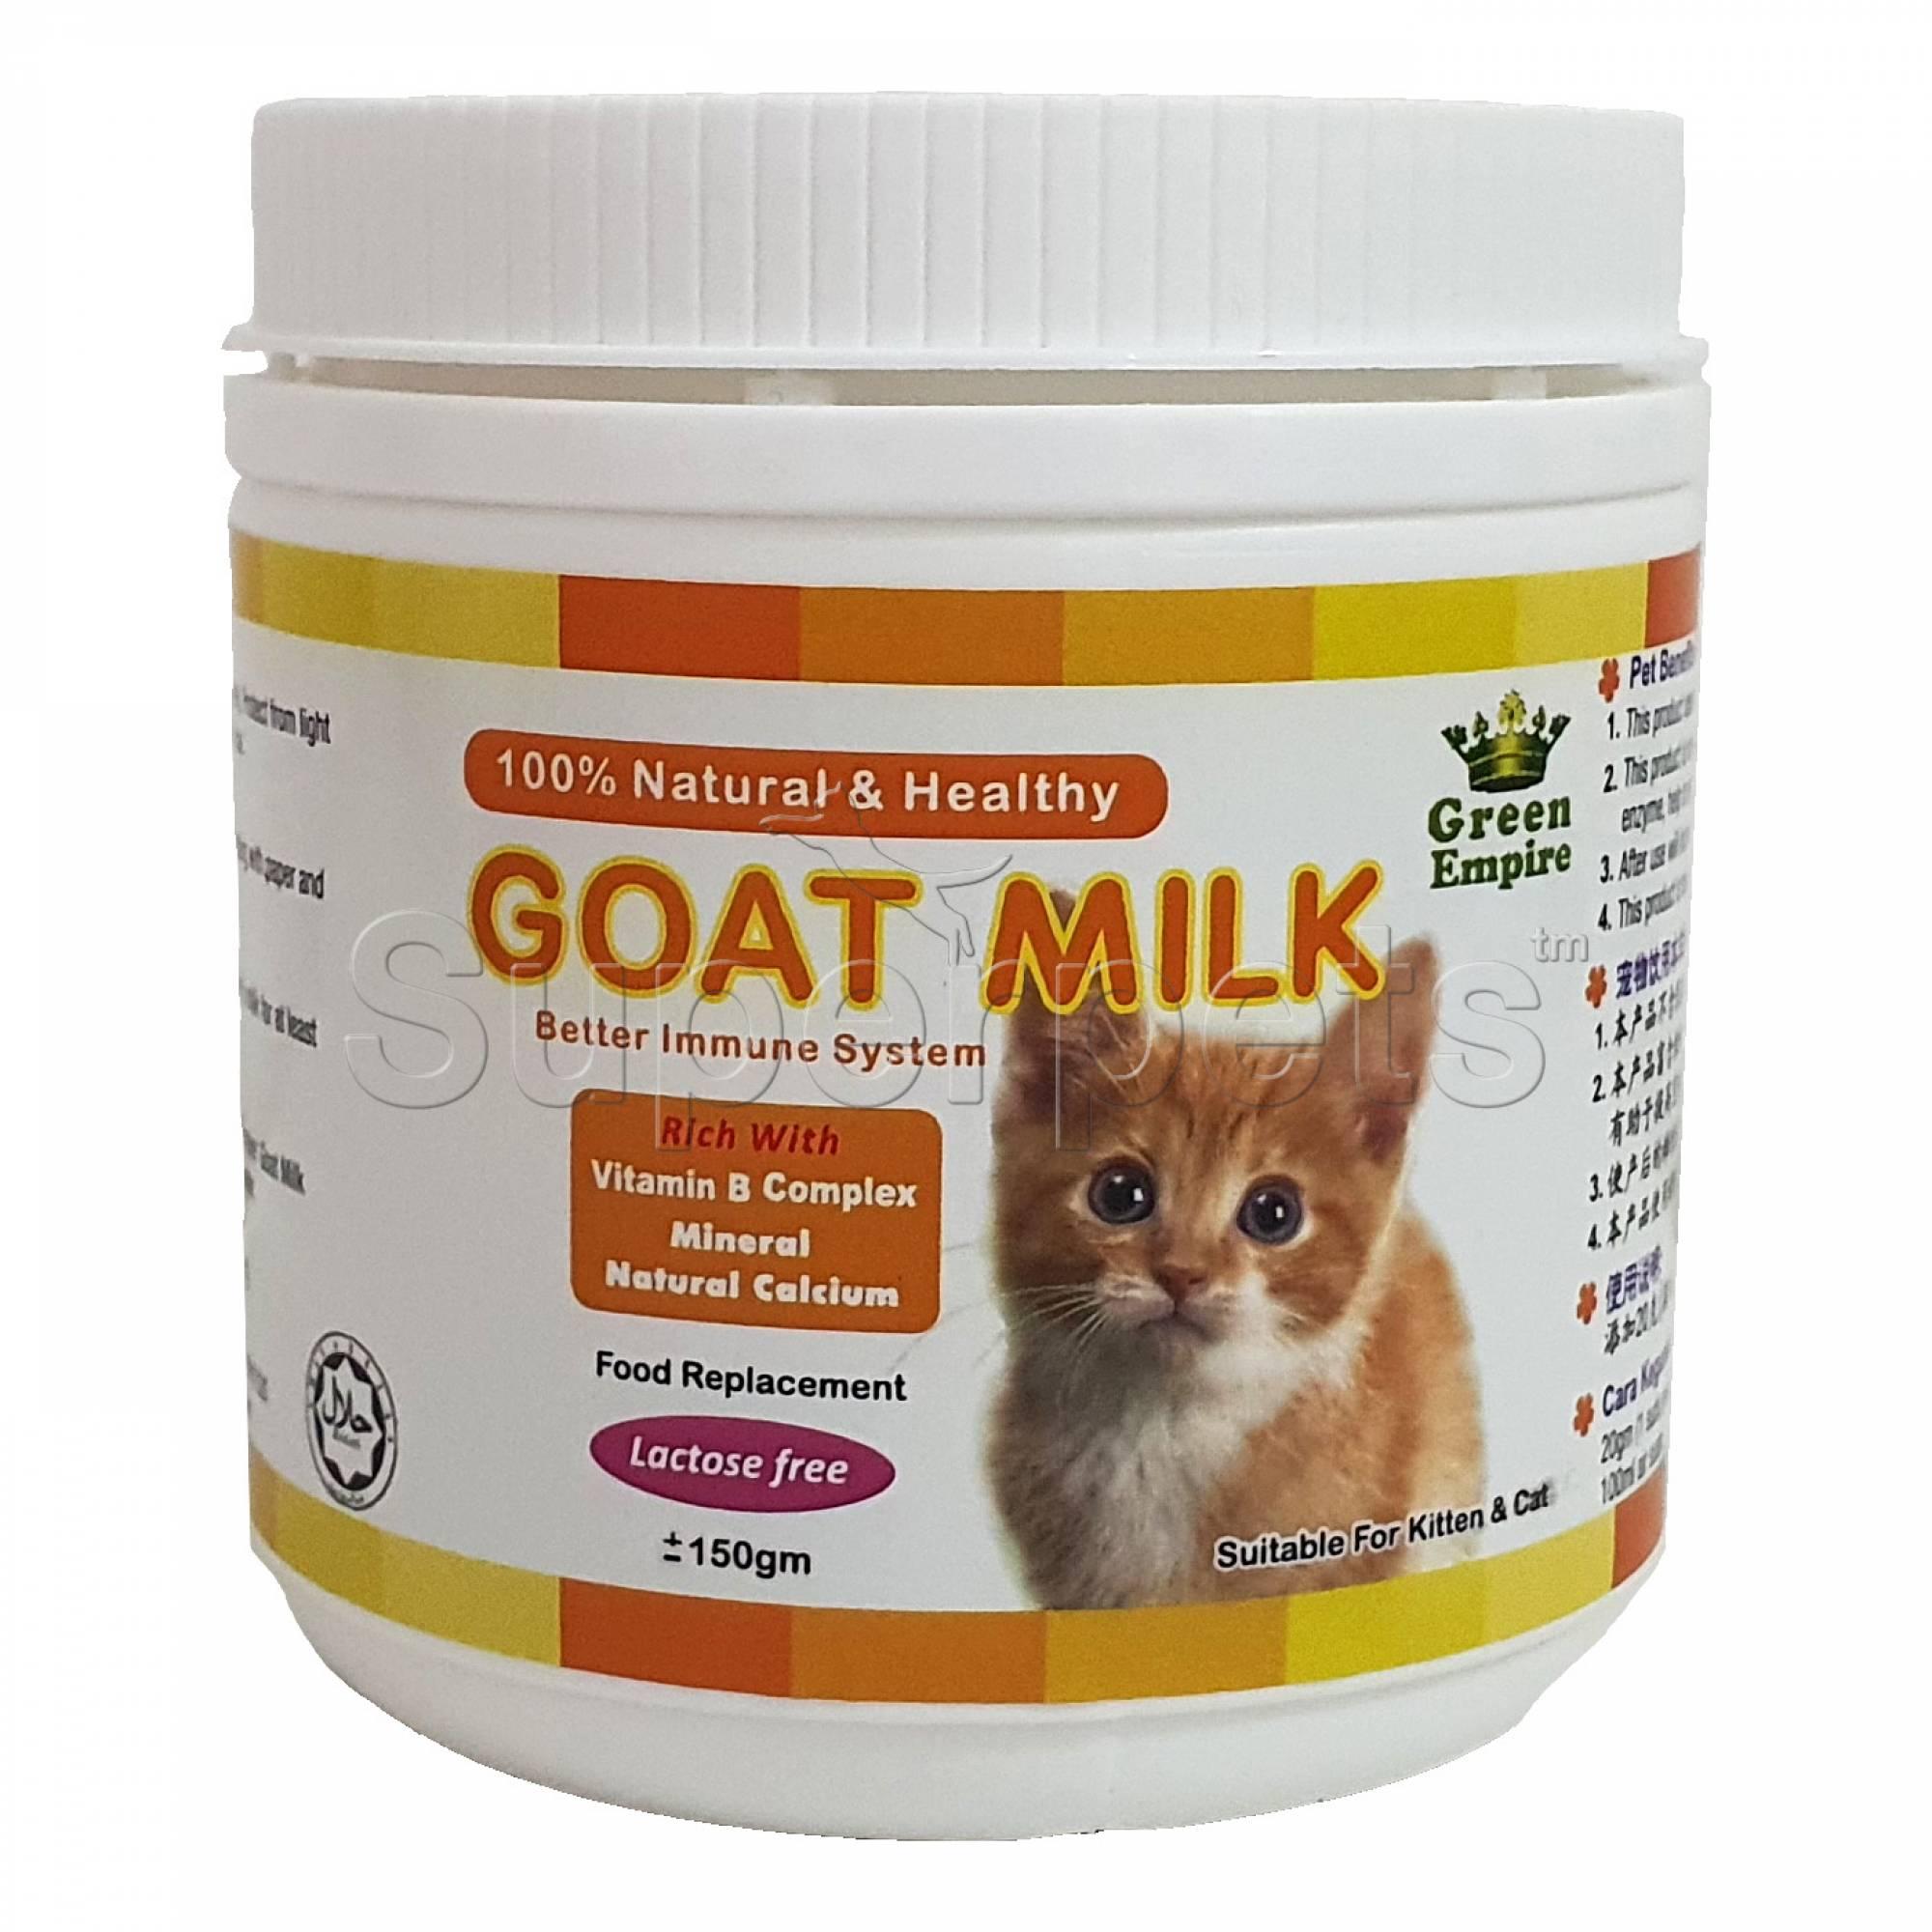 Green Empire Goat Milk Powder for Kitten and Cat 150g